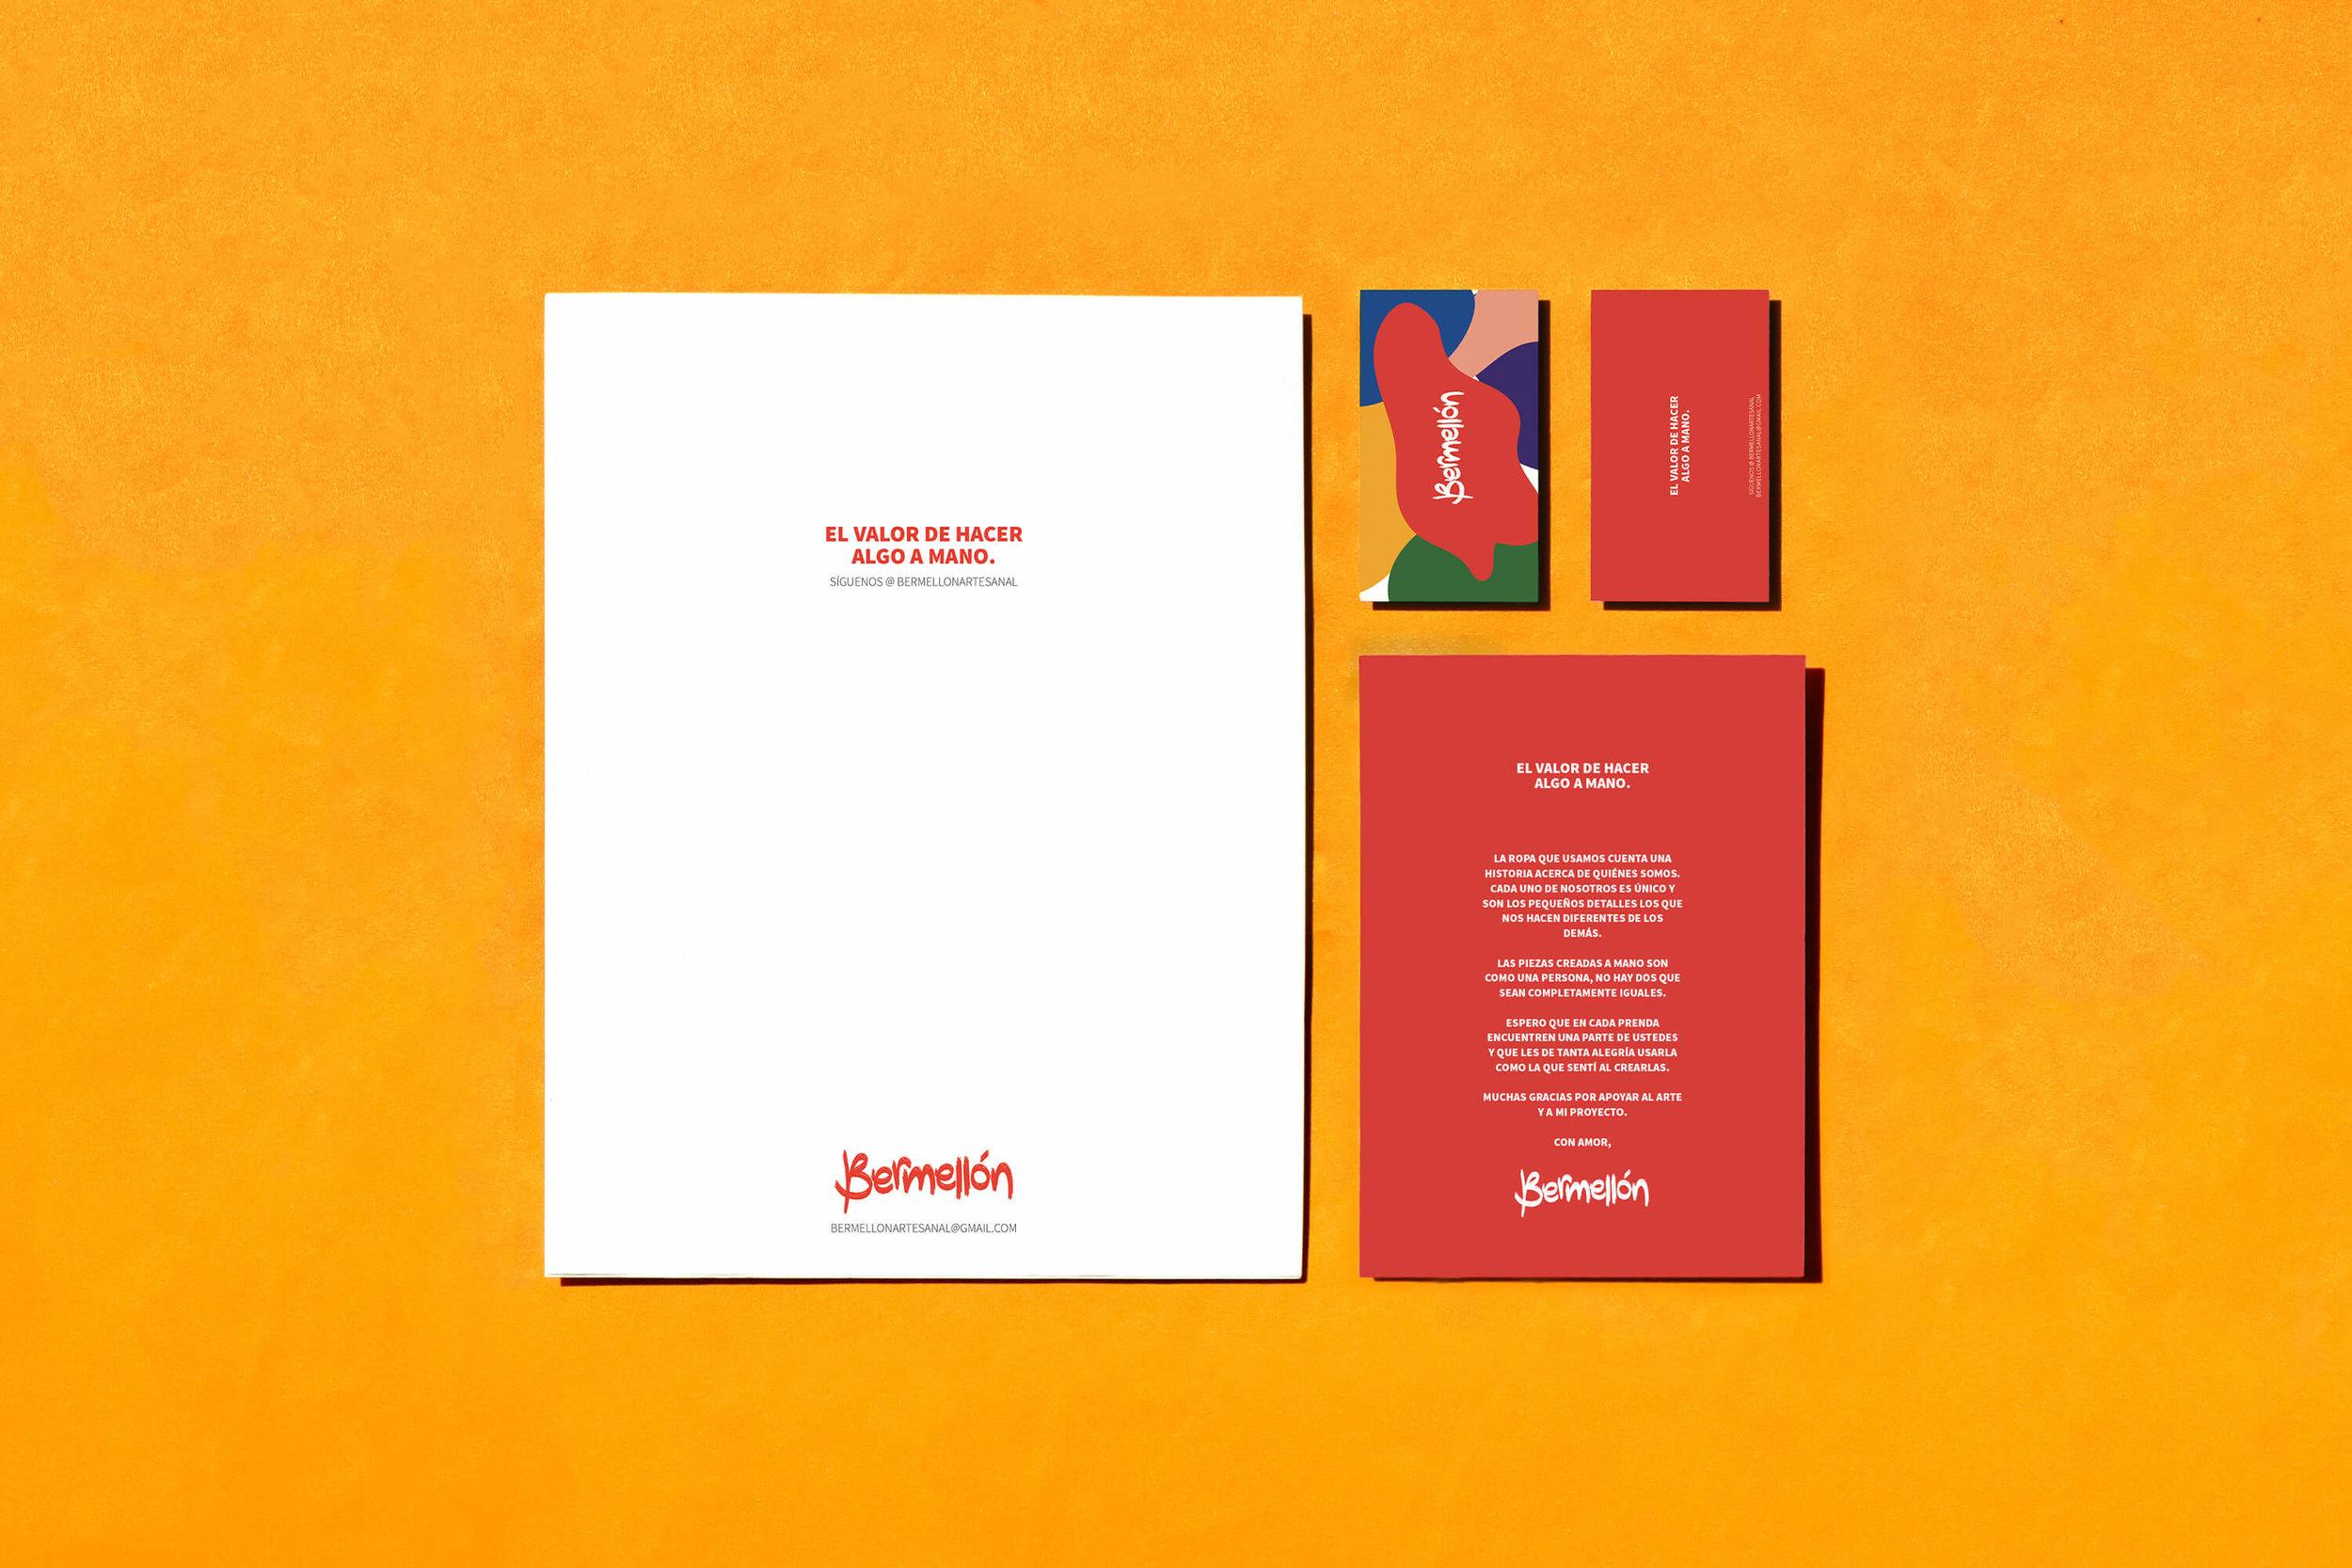 logo-design-branding-san-diego-vortic-bermellon-10-2